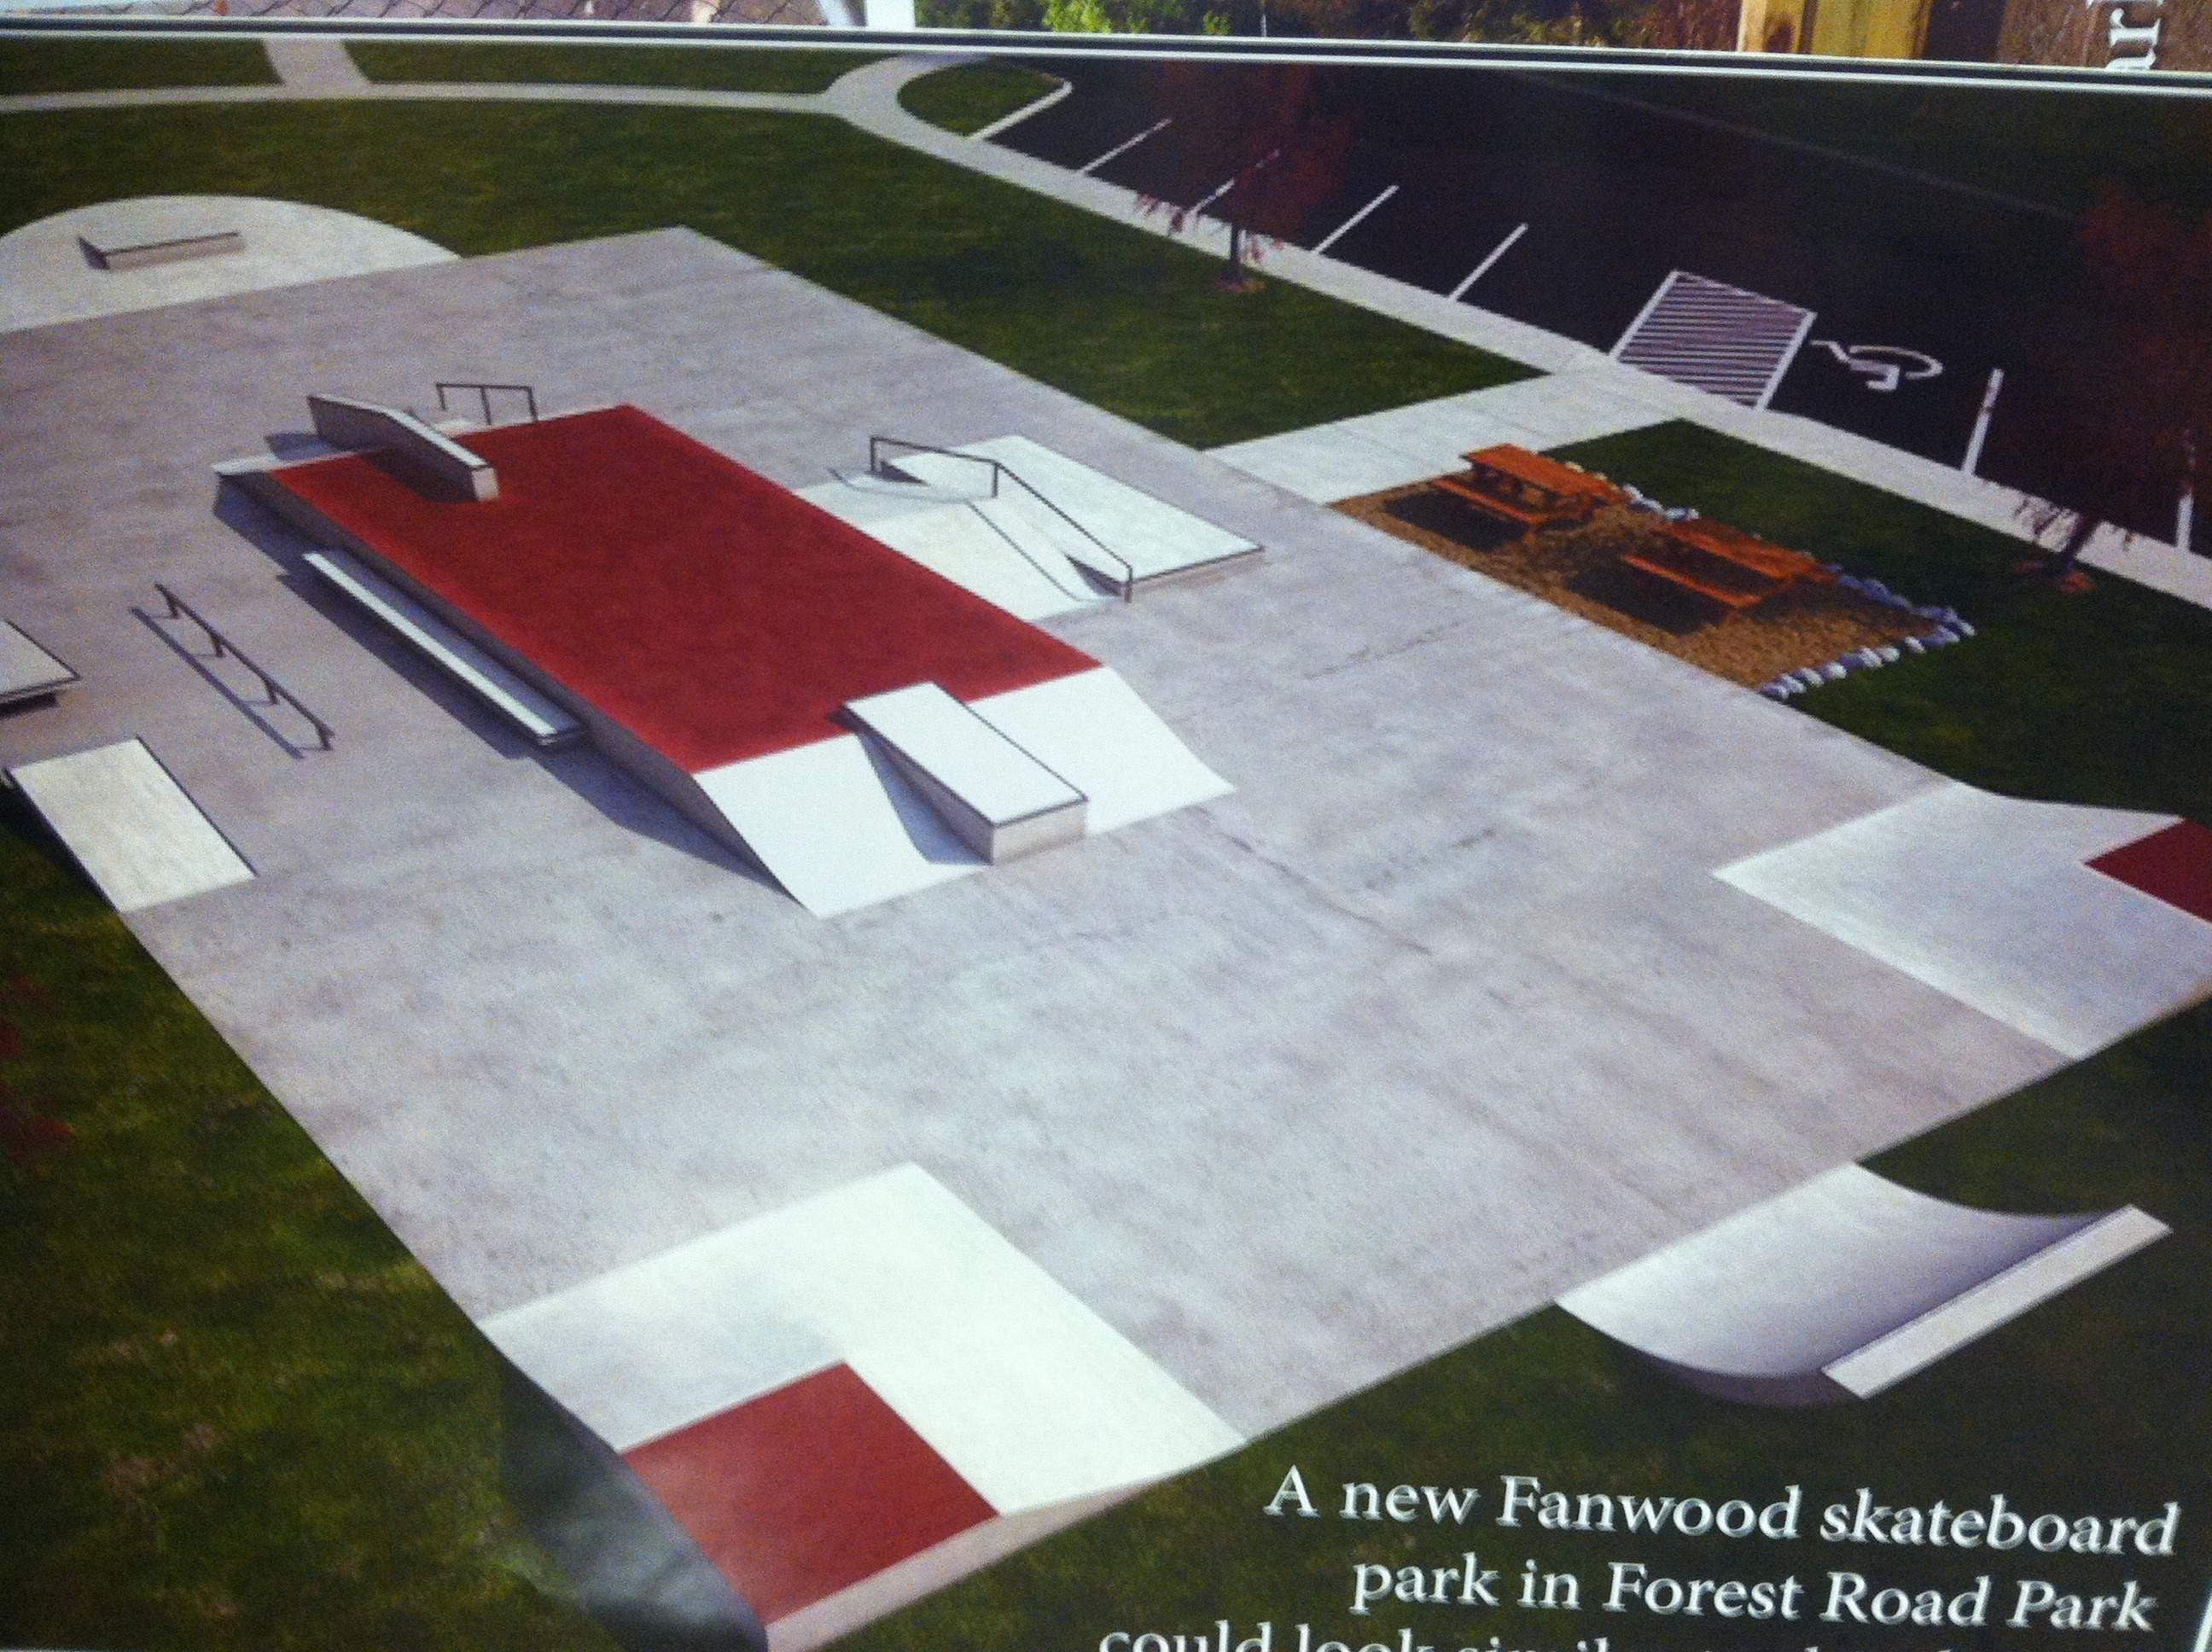 e7b05bde05b43c0ace67_proposted_skate_park.JPG